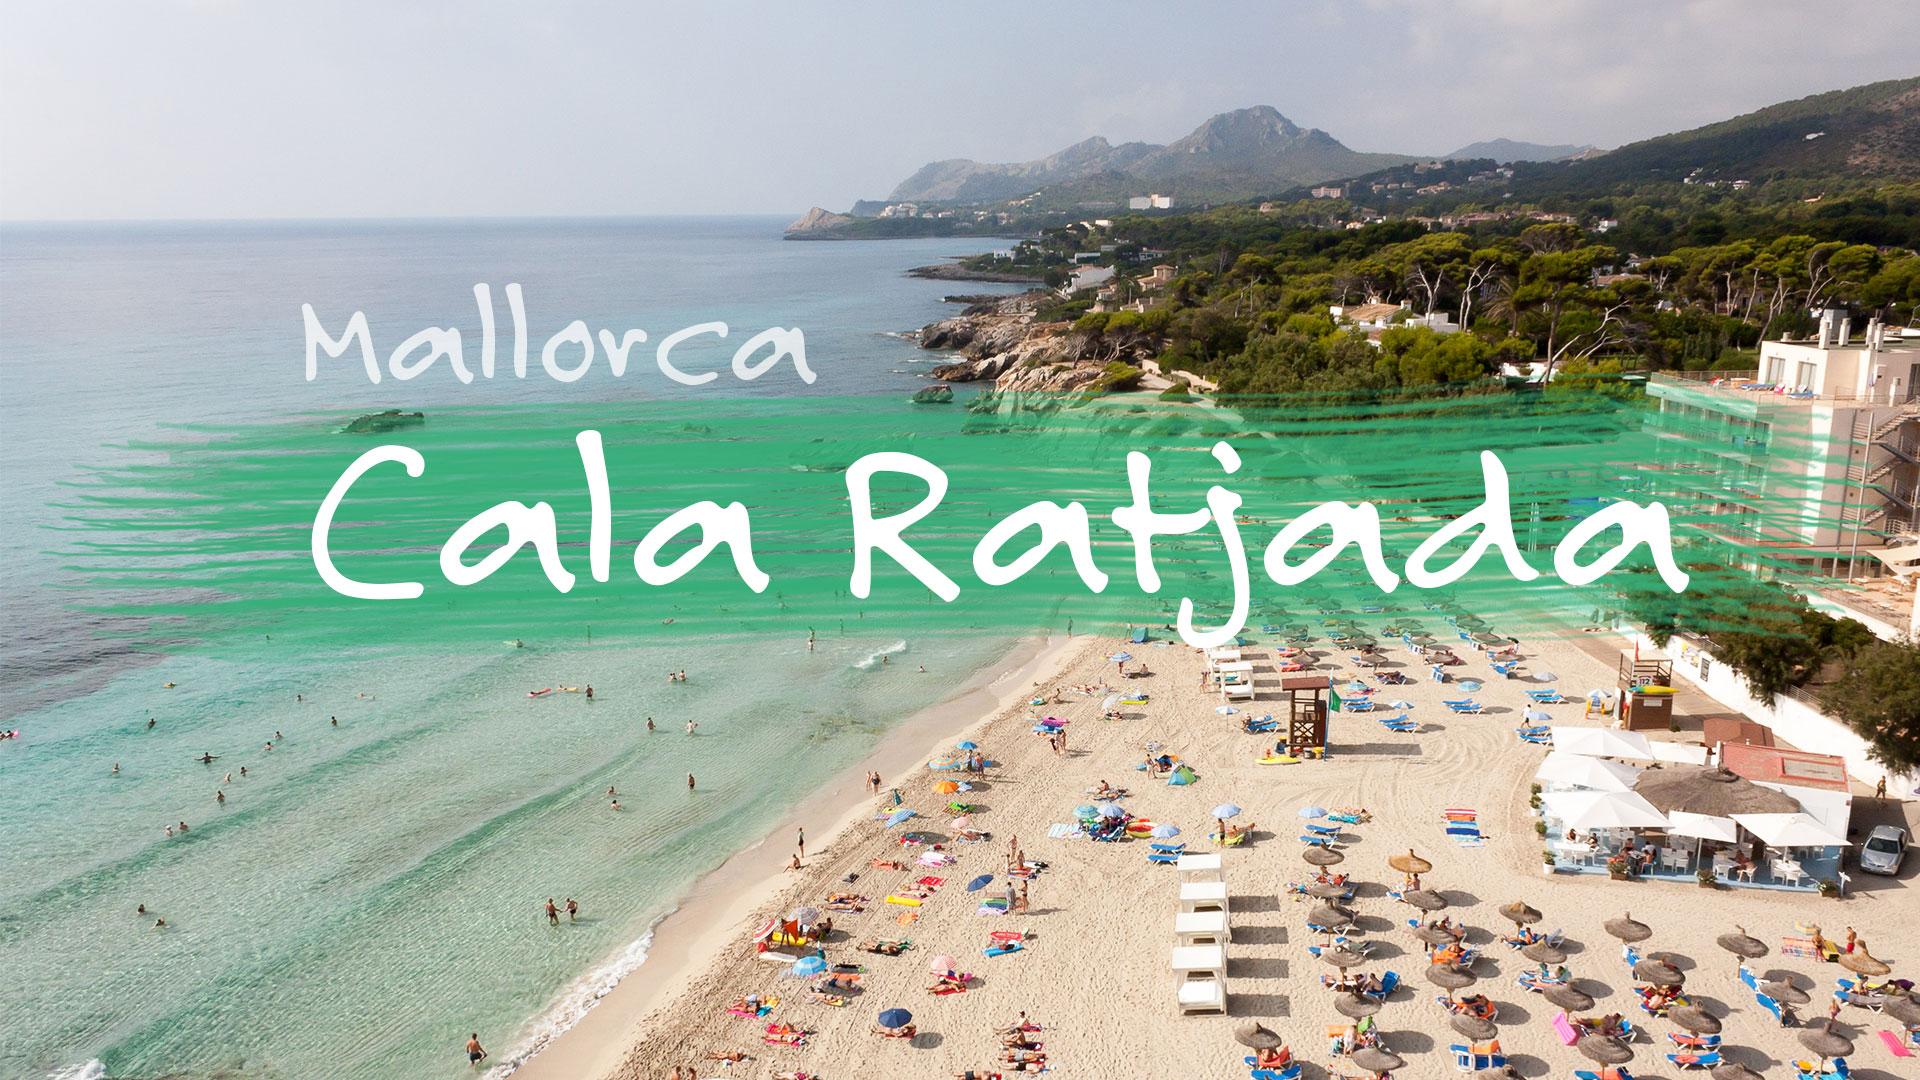 Cala Ratjada Mallorca Hotel